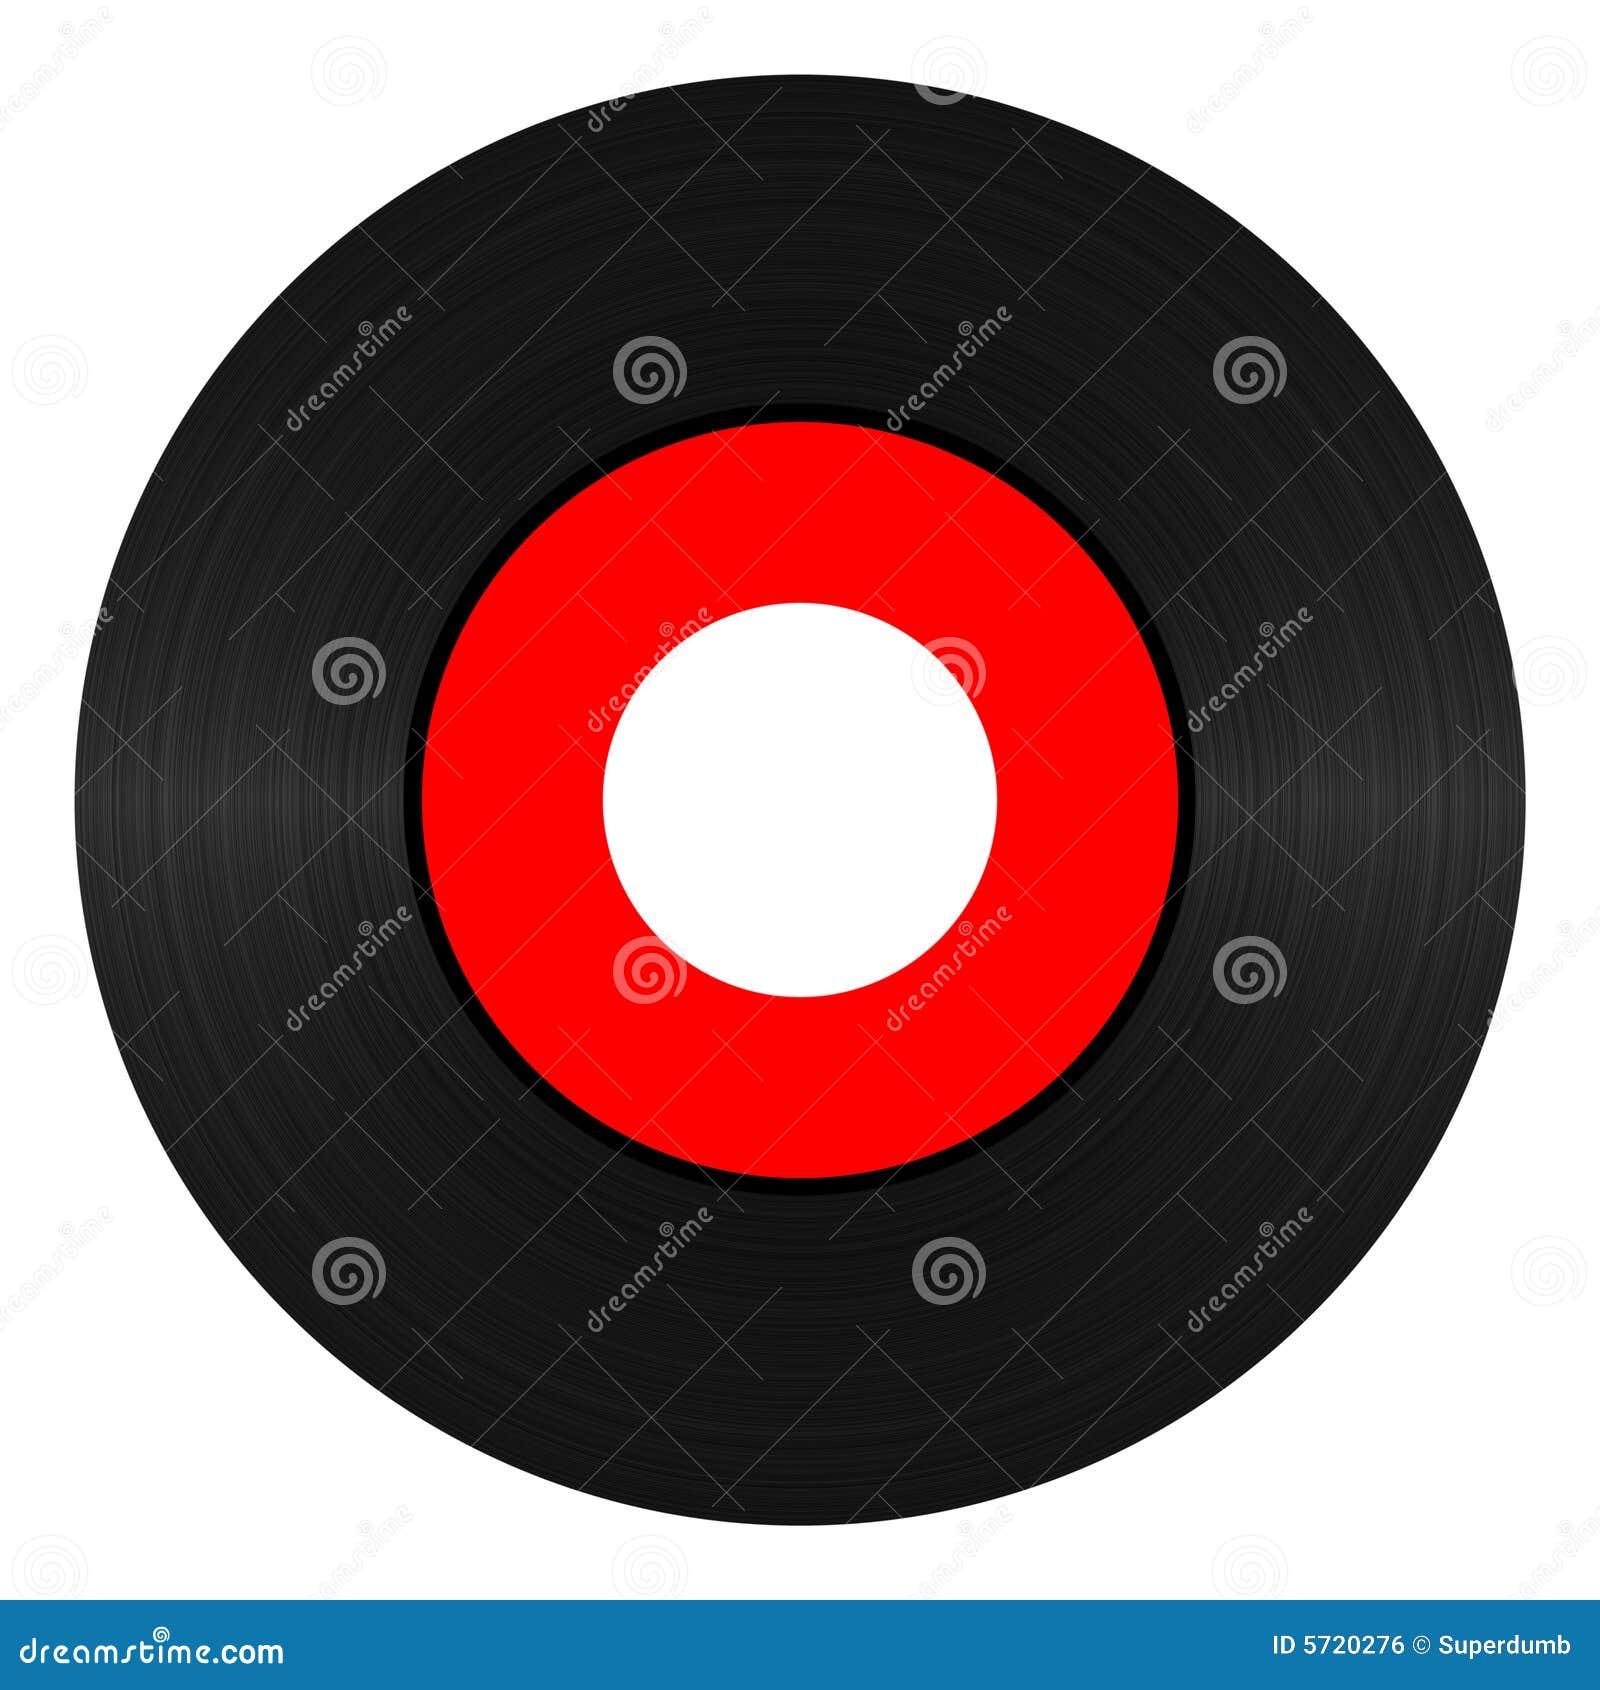 Vinyl Record 45 Rpm Royalty Free Stock Image Image 5720276